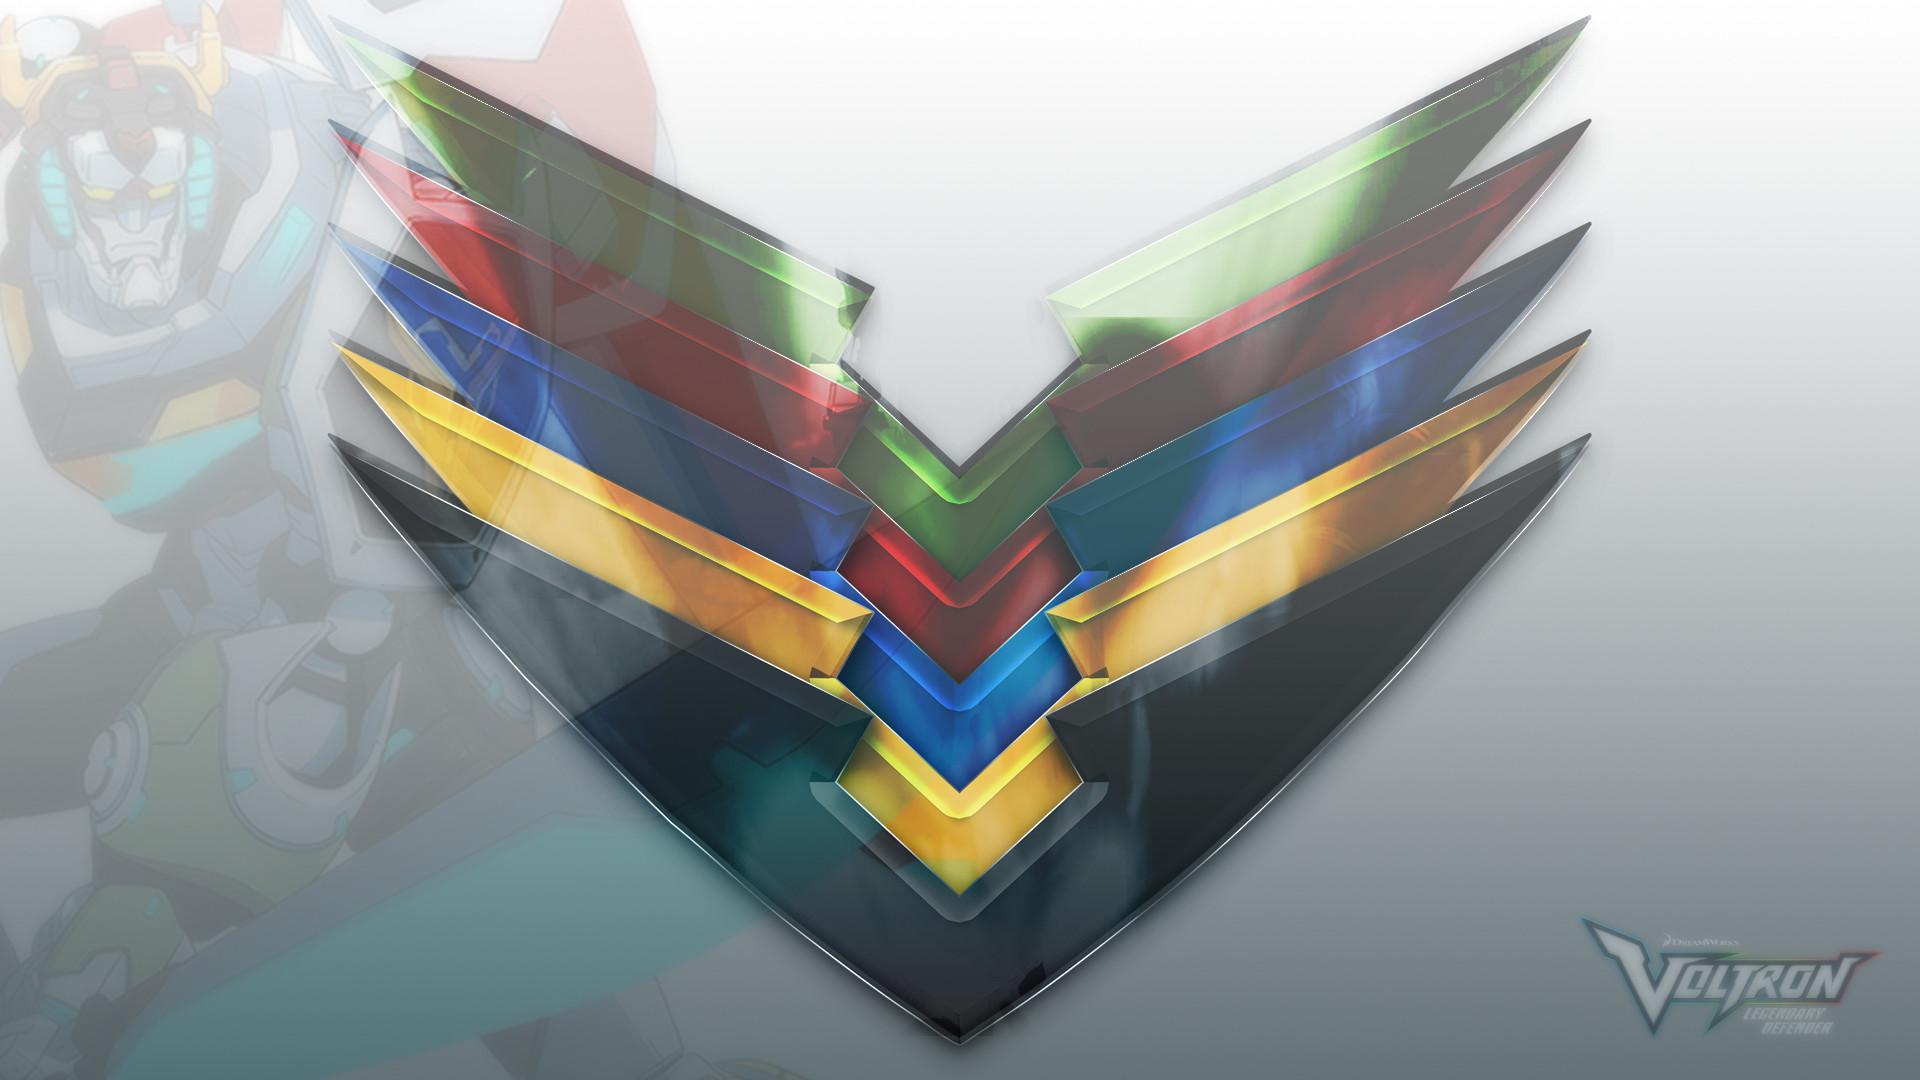 Voltron Legendary Defender Wallpapers